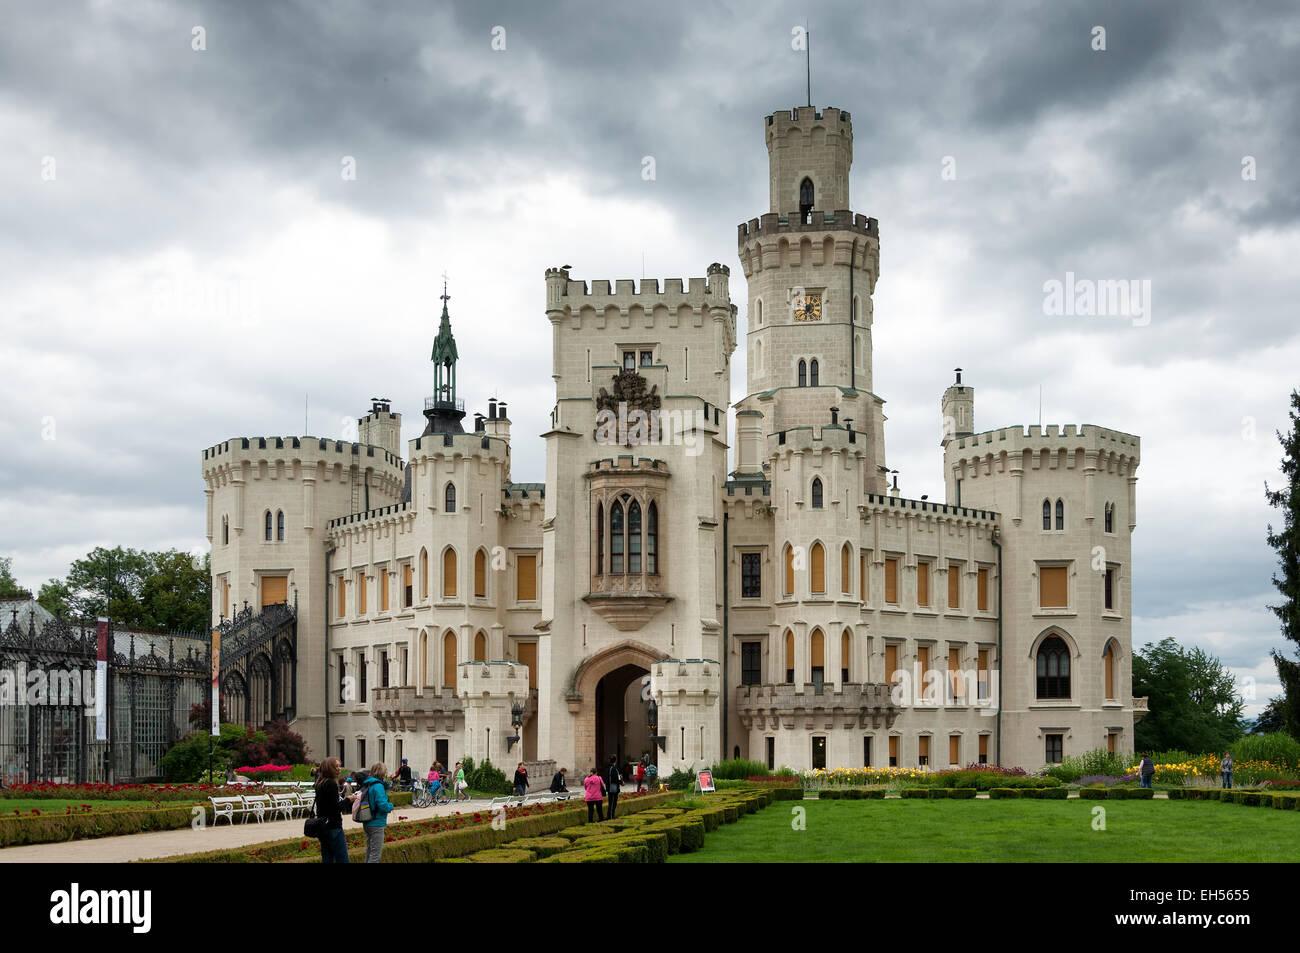 Hluboka nad Vltavou Castle - Stock Image